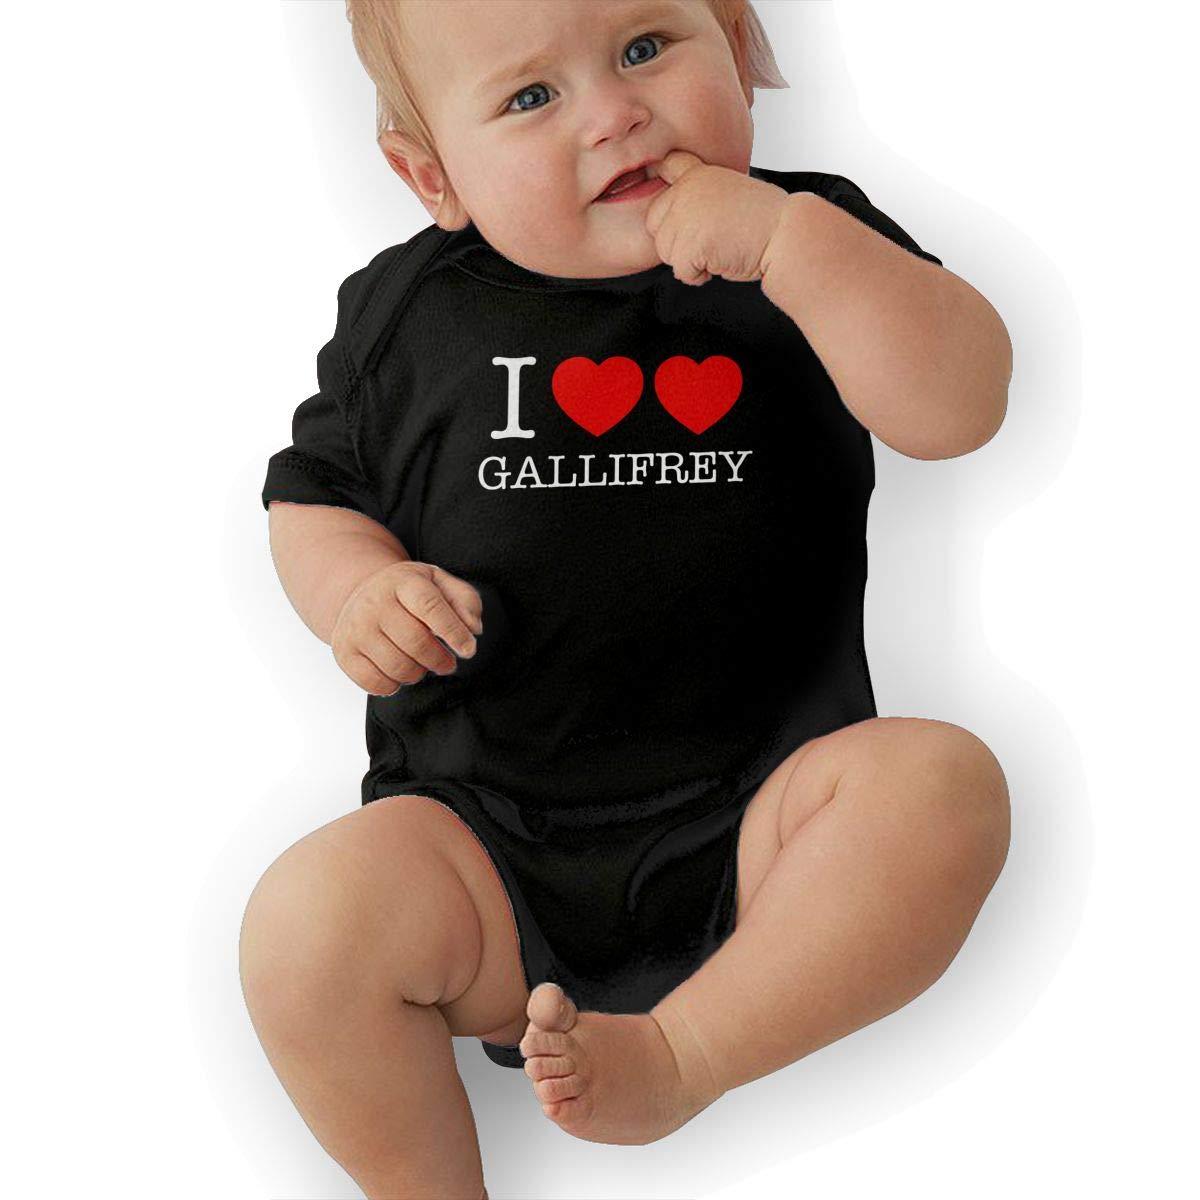 Mri-le2 Newborn Kids Short Sleeve Jumpsuit I Heart Heart Gallifrey-1 Infant Romper Jumpsuit